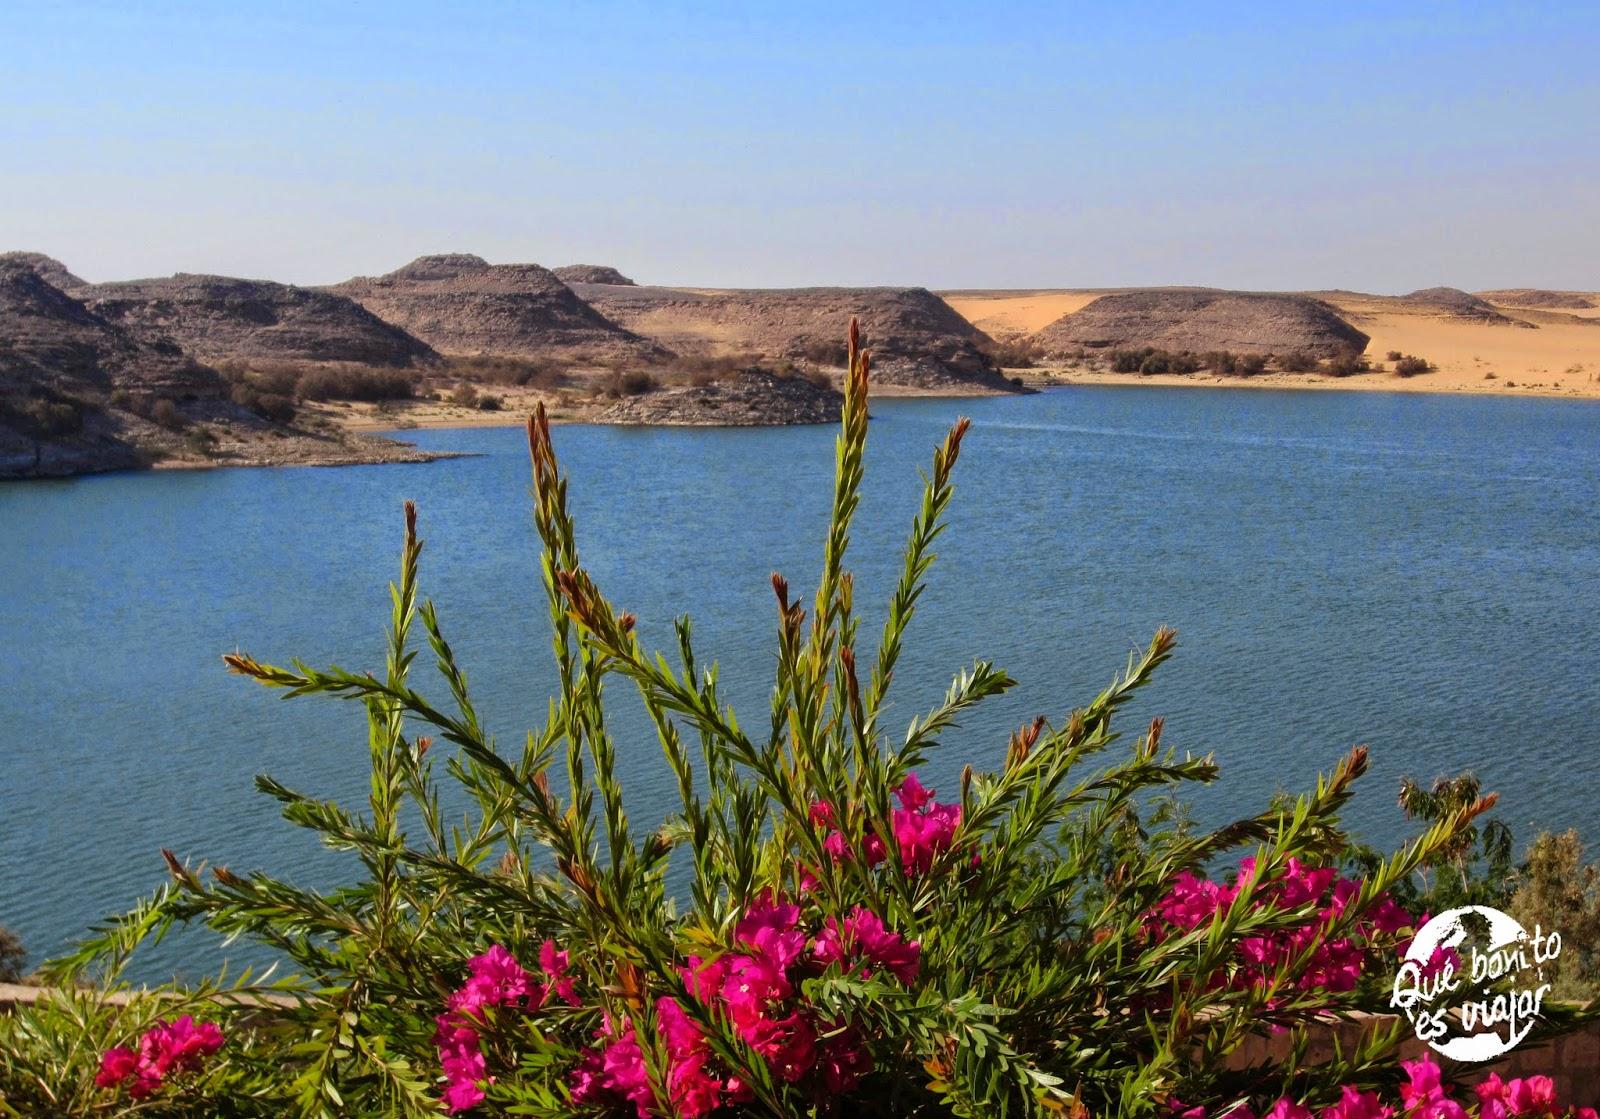 Abu Simbel Lago Nasser